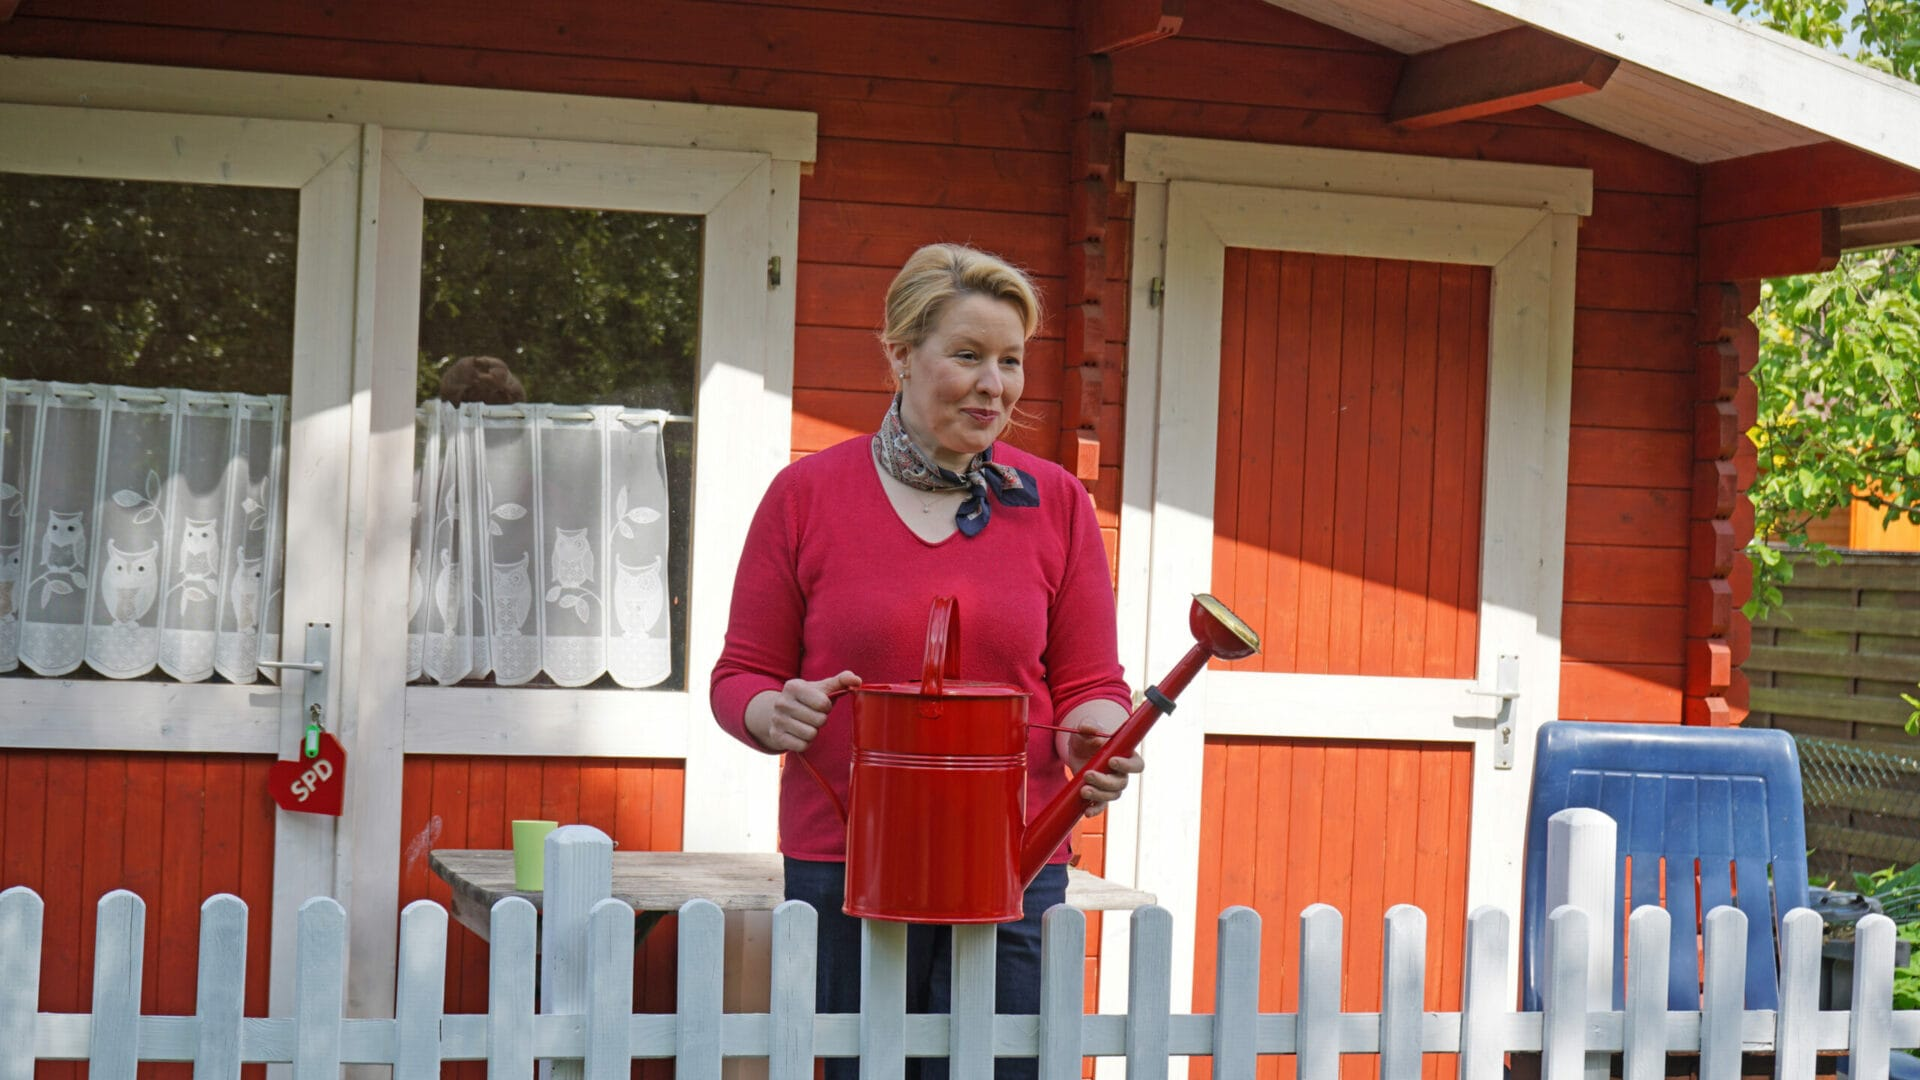 Franziska Giffey vor dem Gartenhaus